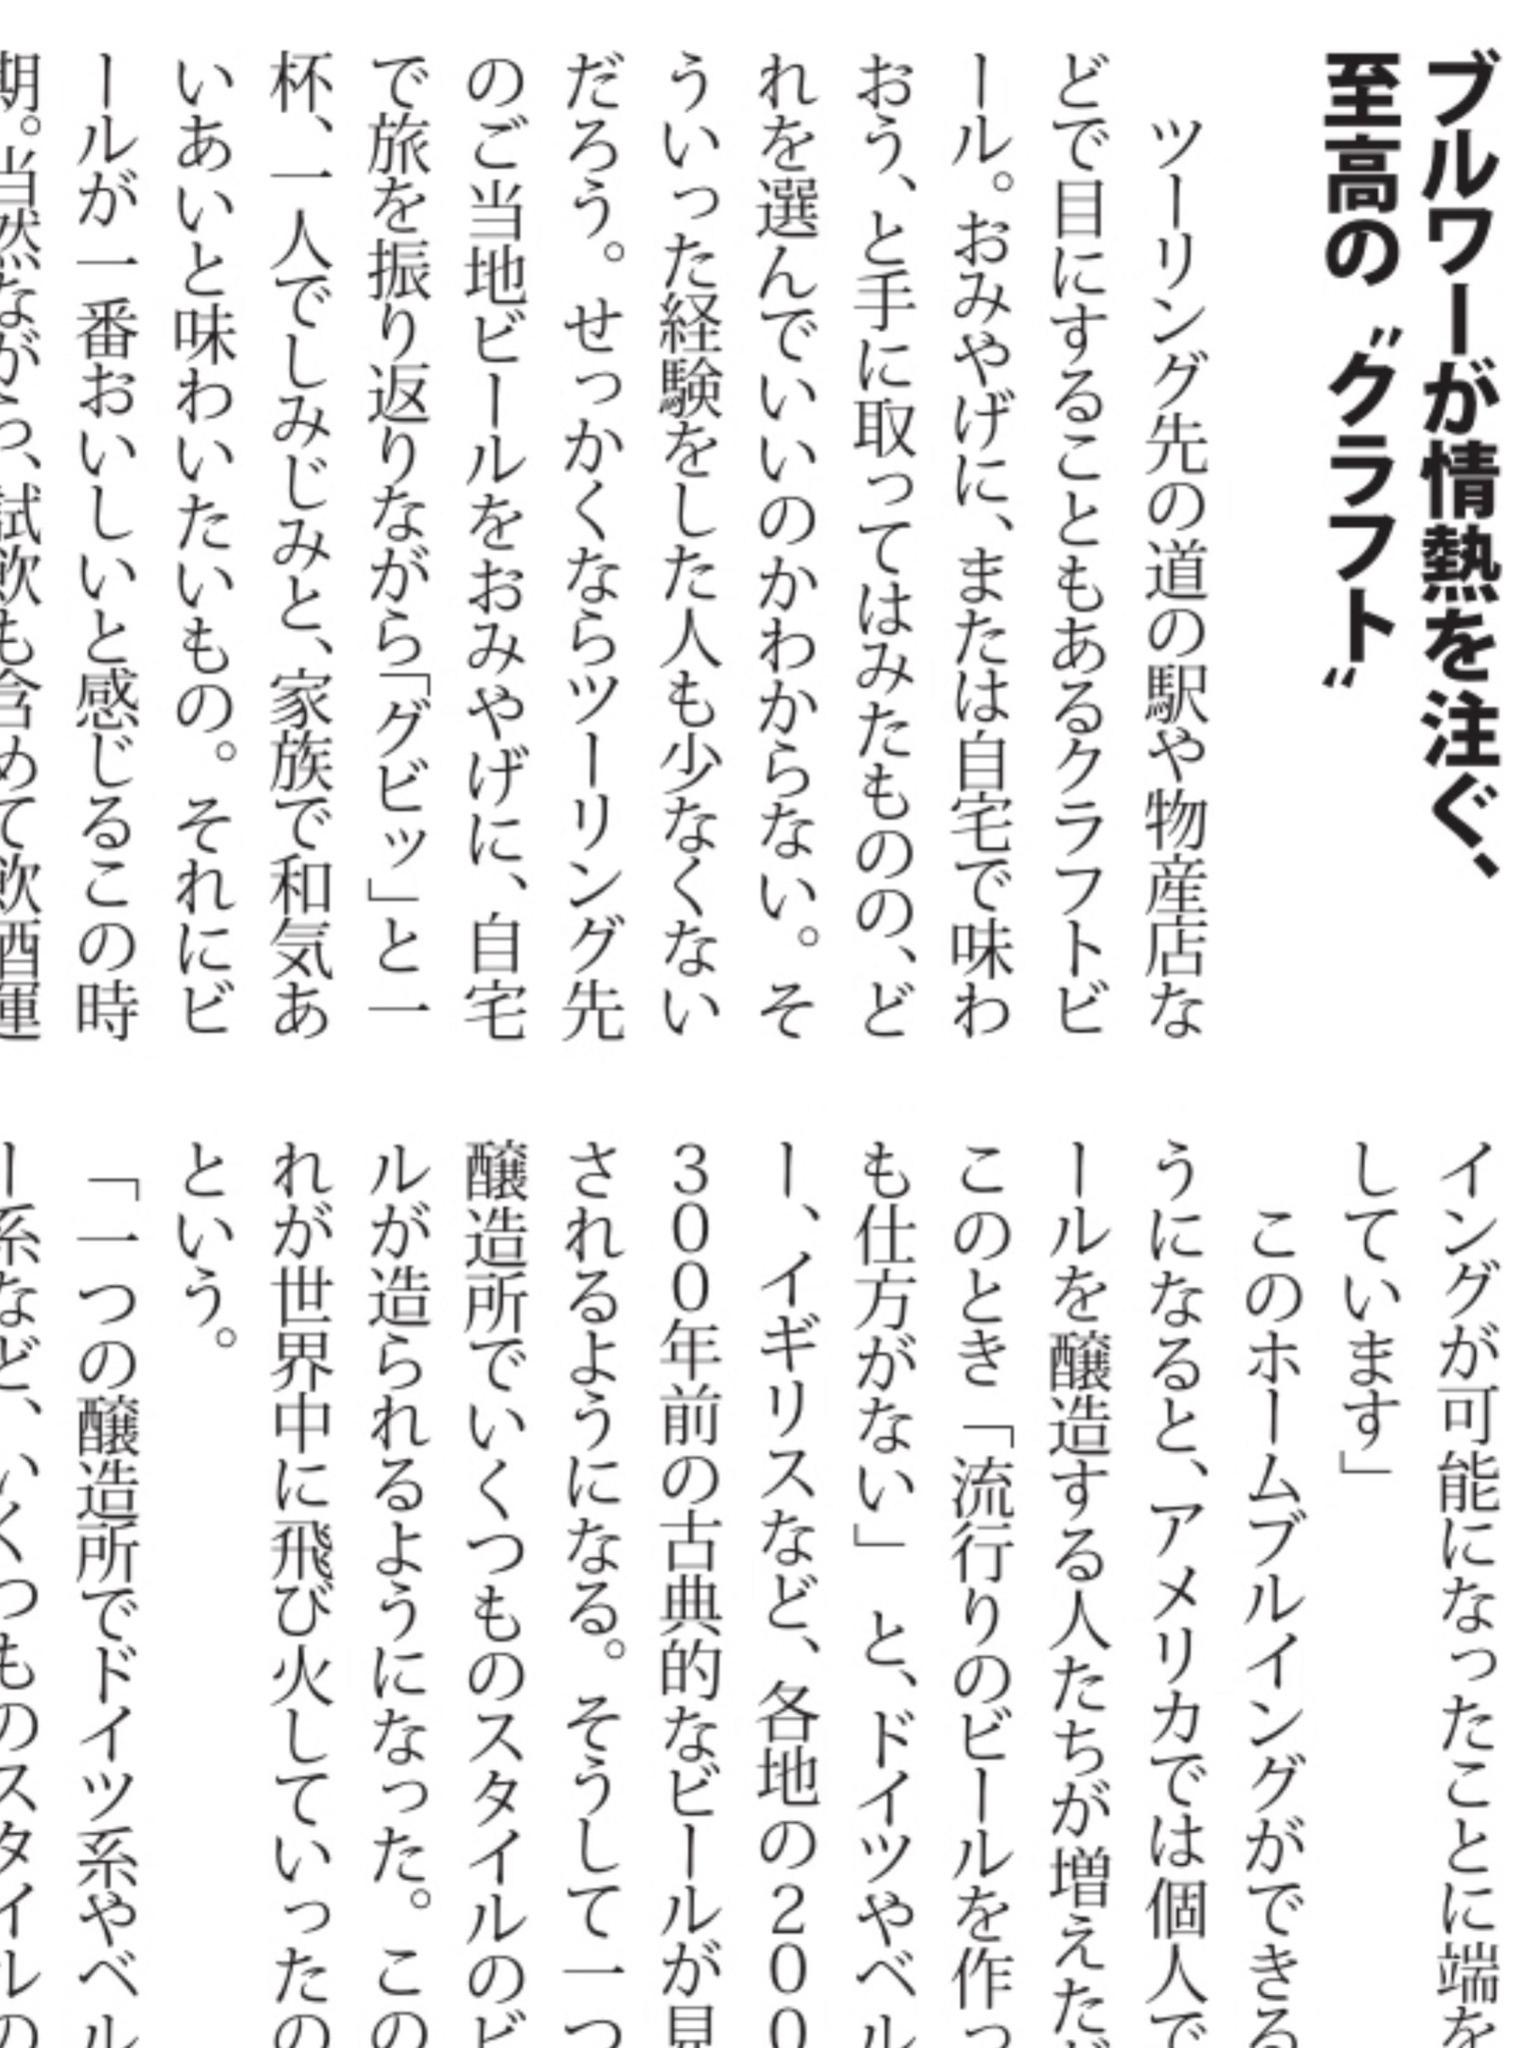 f:id:ToshUeno:20160815213526j:plain